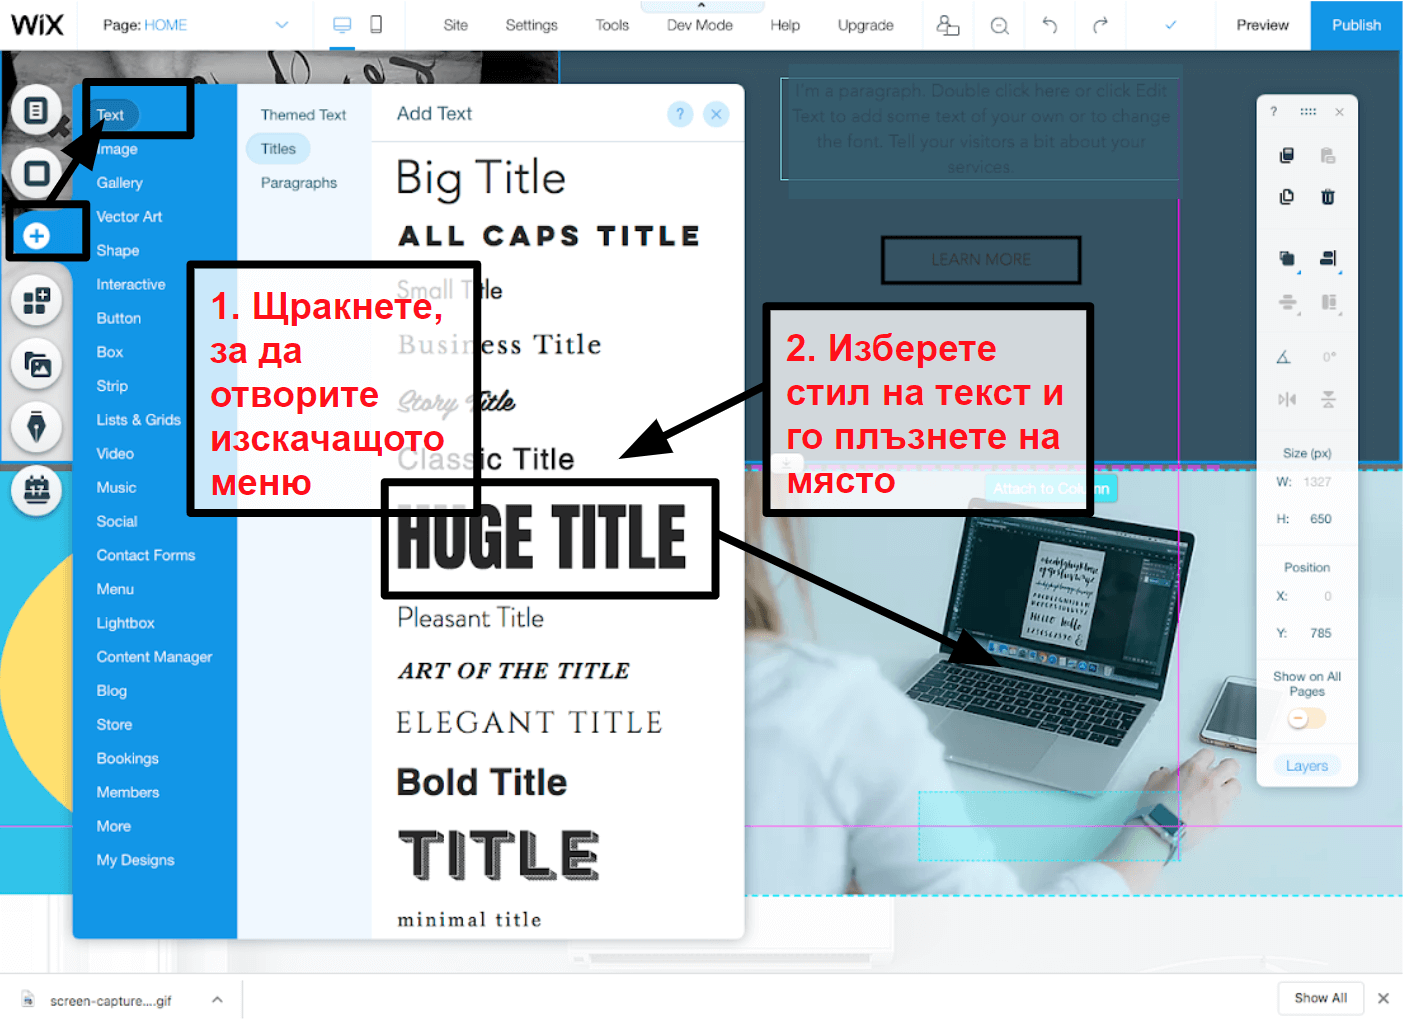 Wix text image BG6